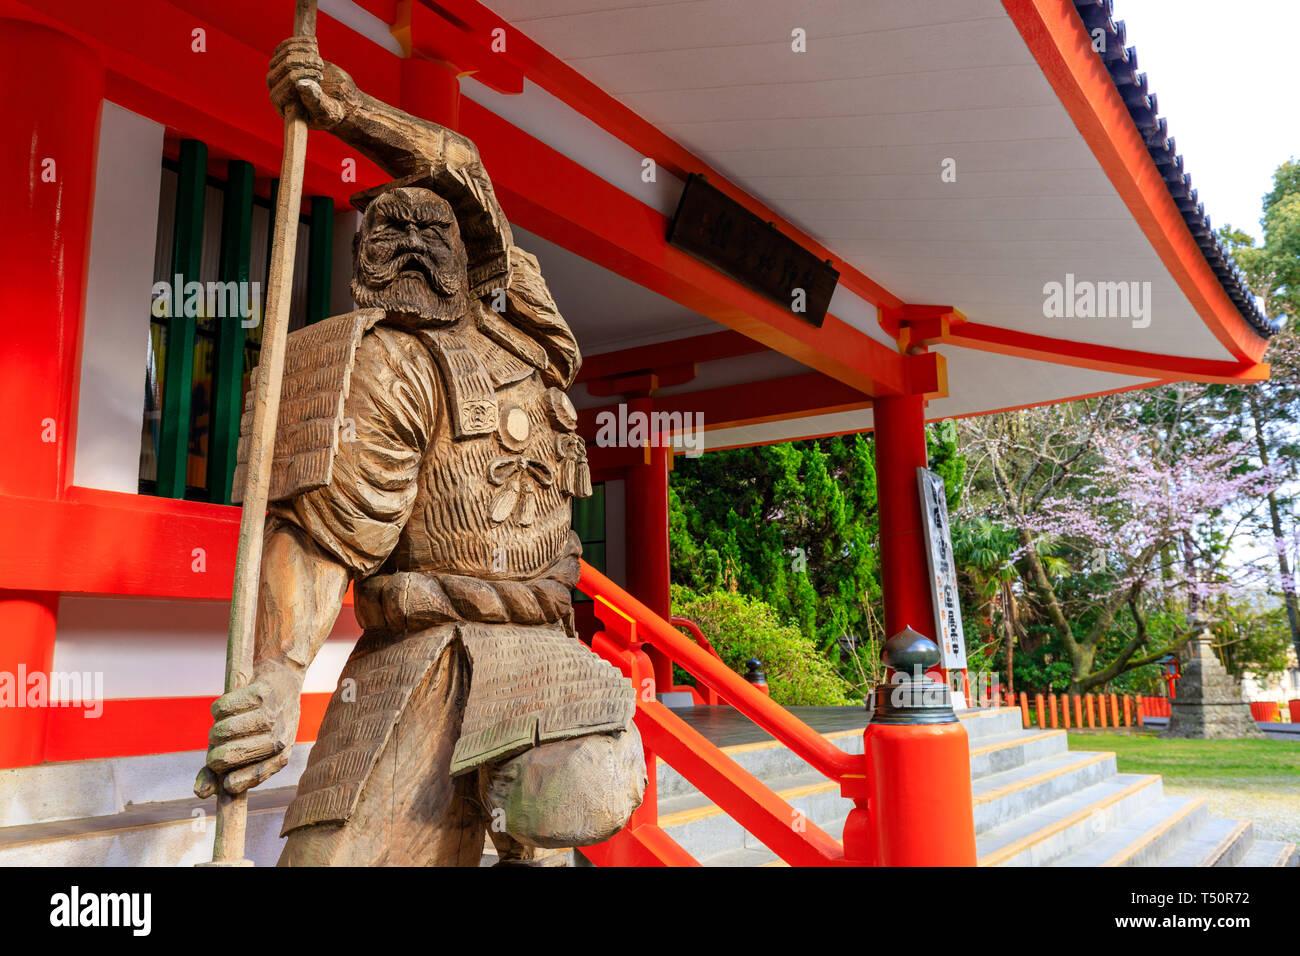 Shinto wooden statue, guardian of the Kumano Hayatama-taisha shrine in Shingu, Japan Stock Photo